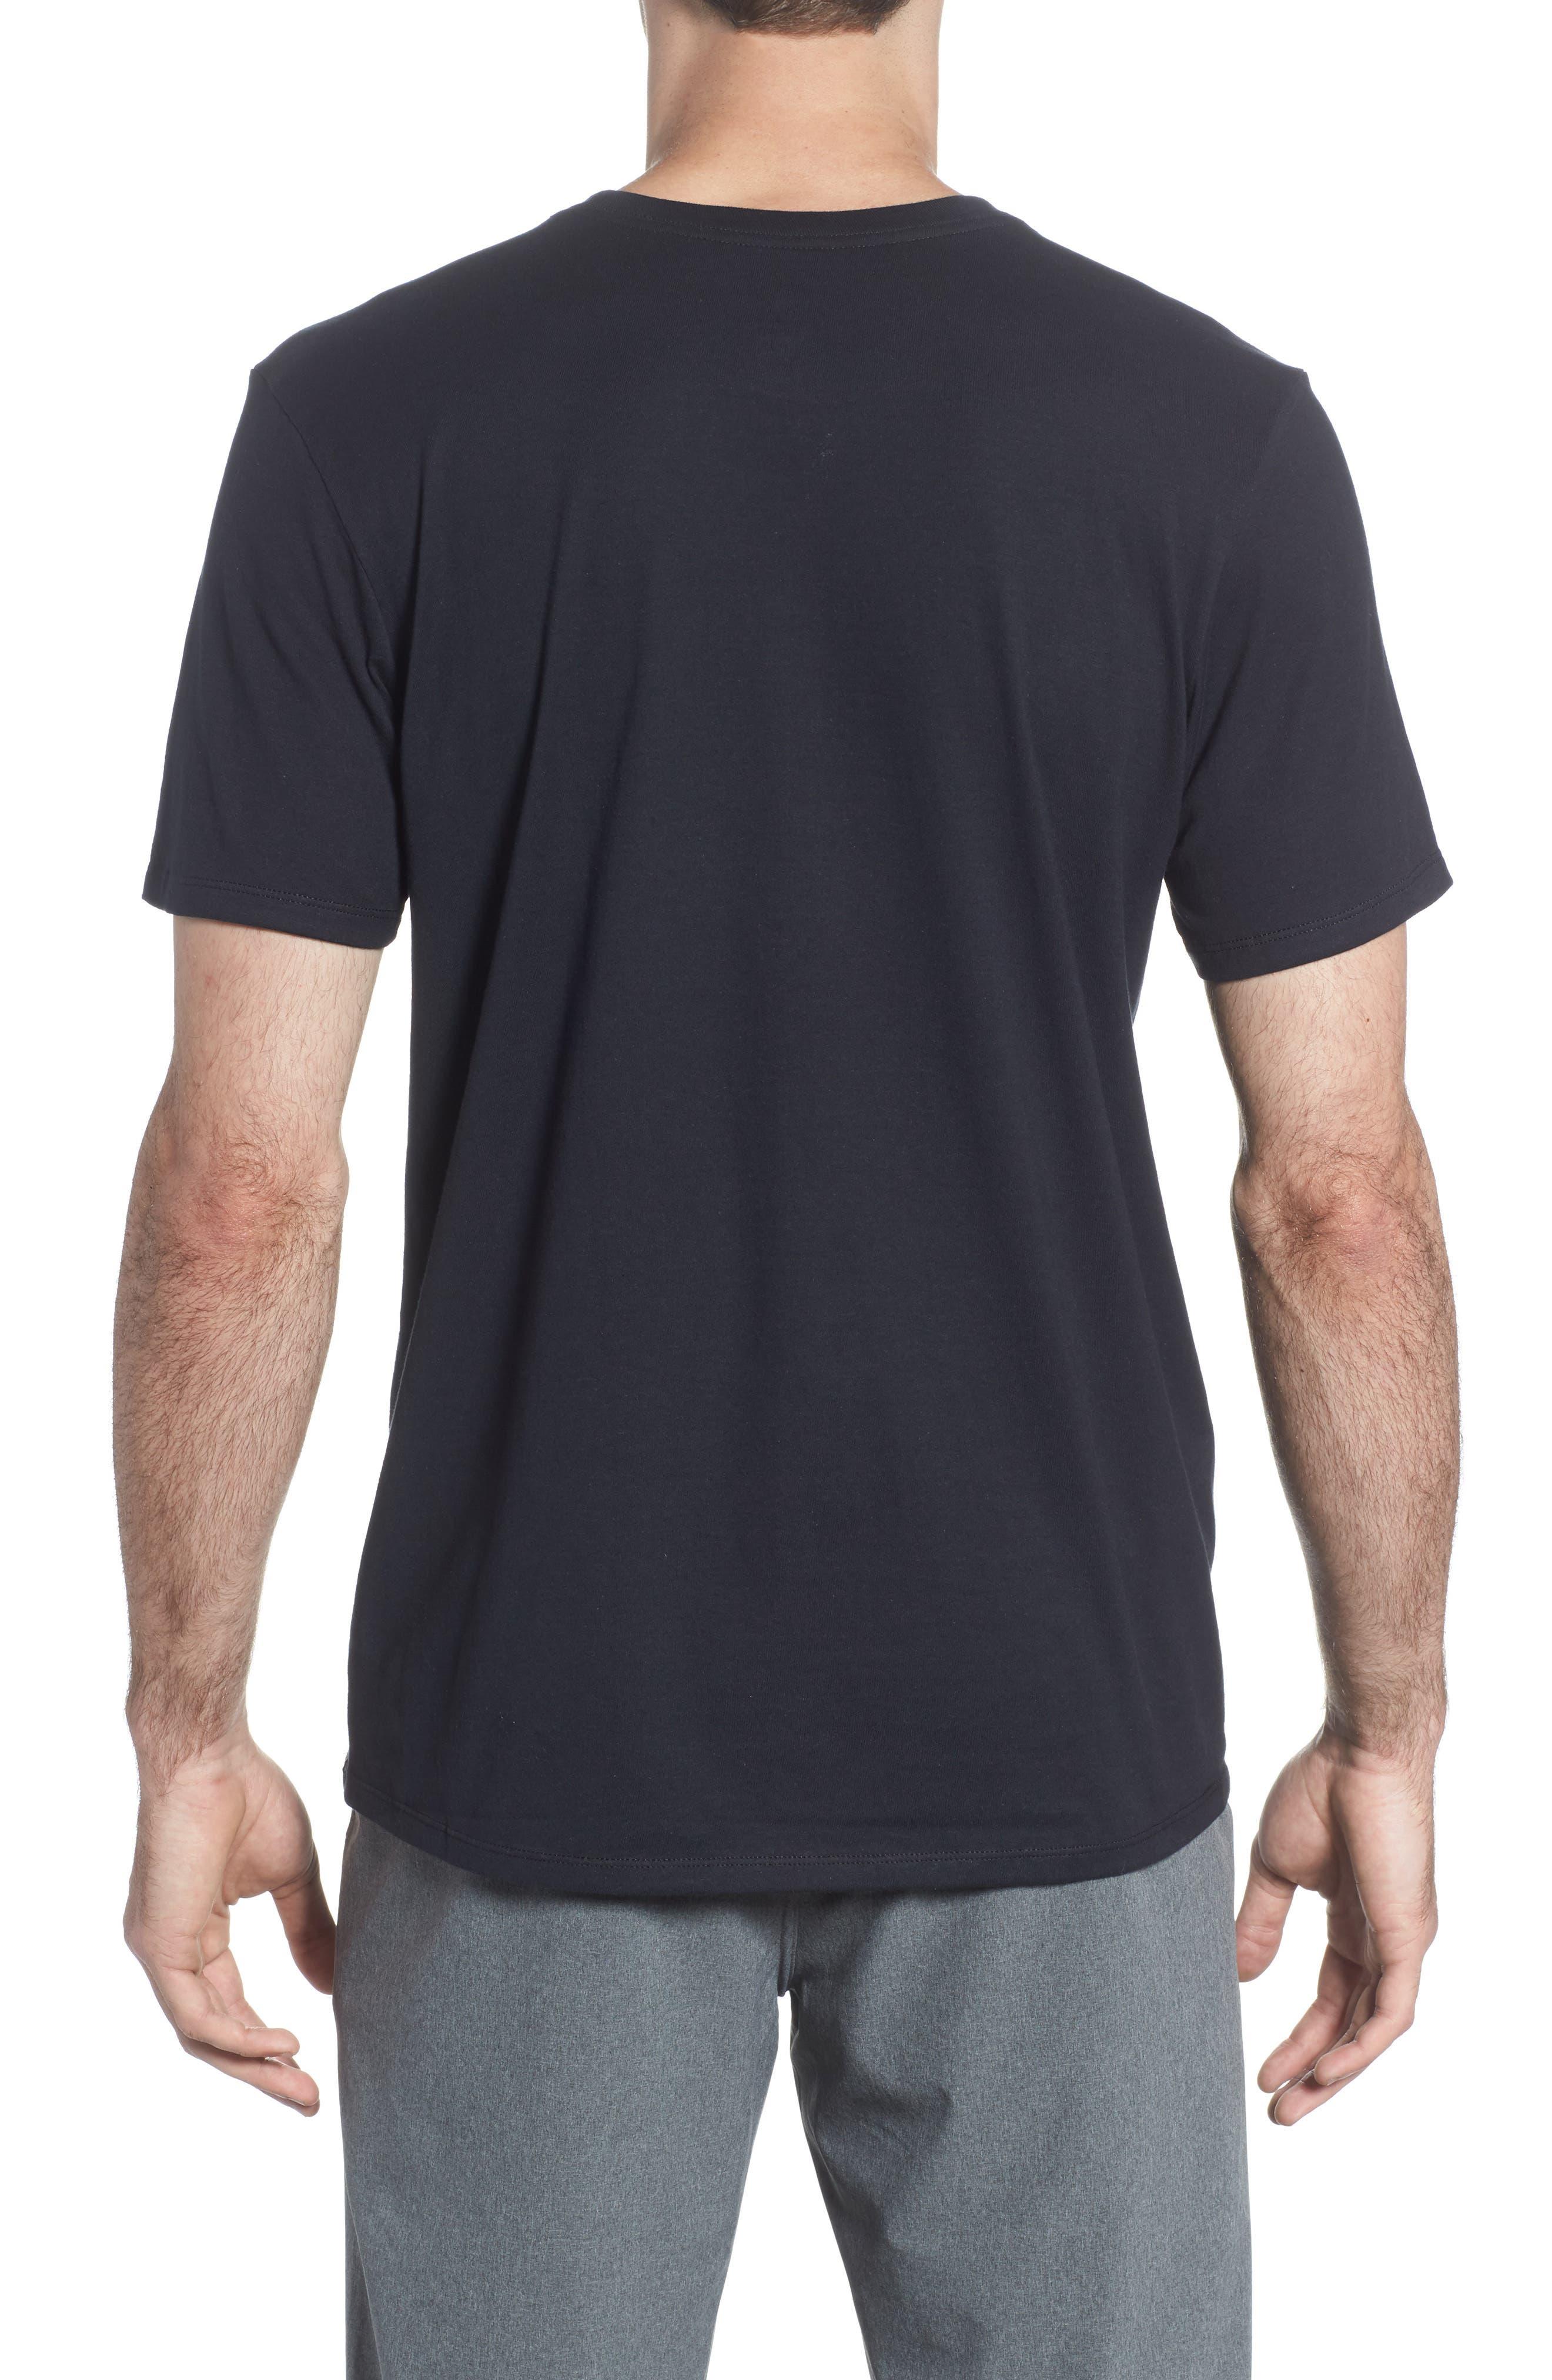 Sportswear 23 T-Shirt,                             Alternate thumbnail 2, color,                             Black/ Infrared 23